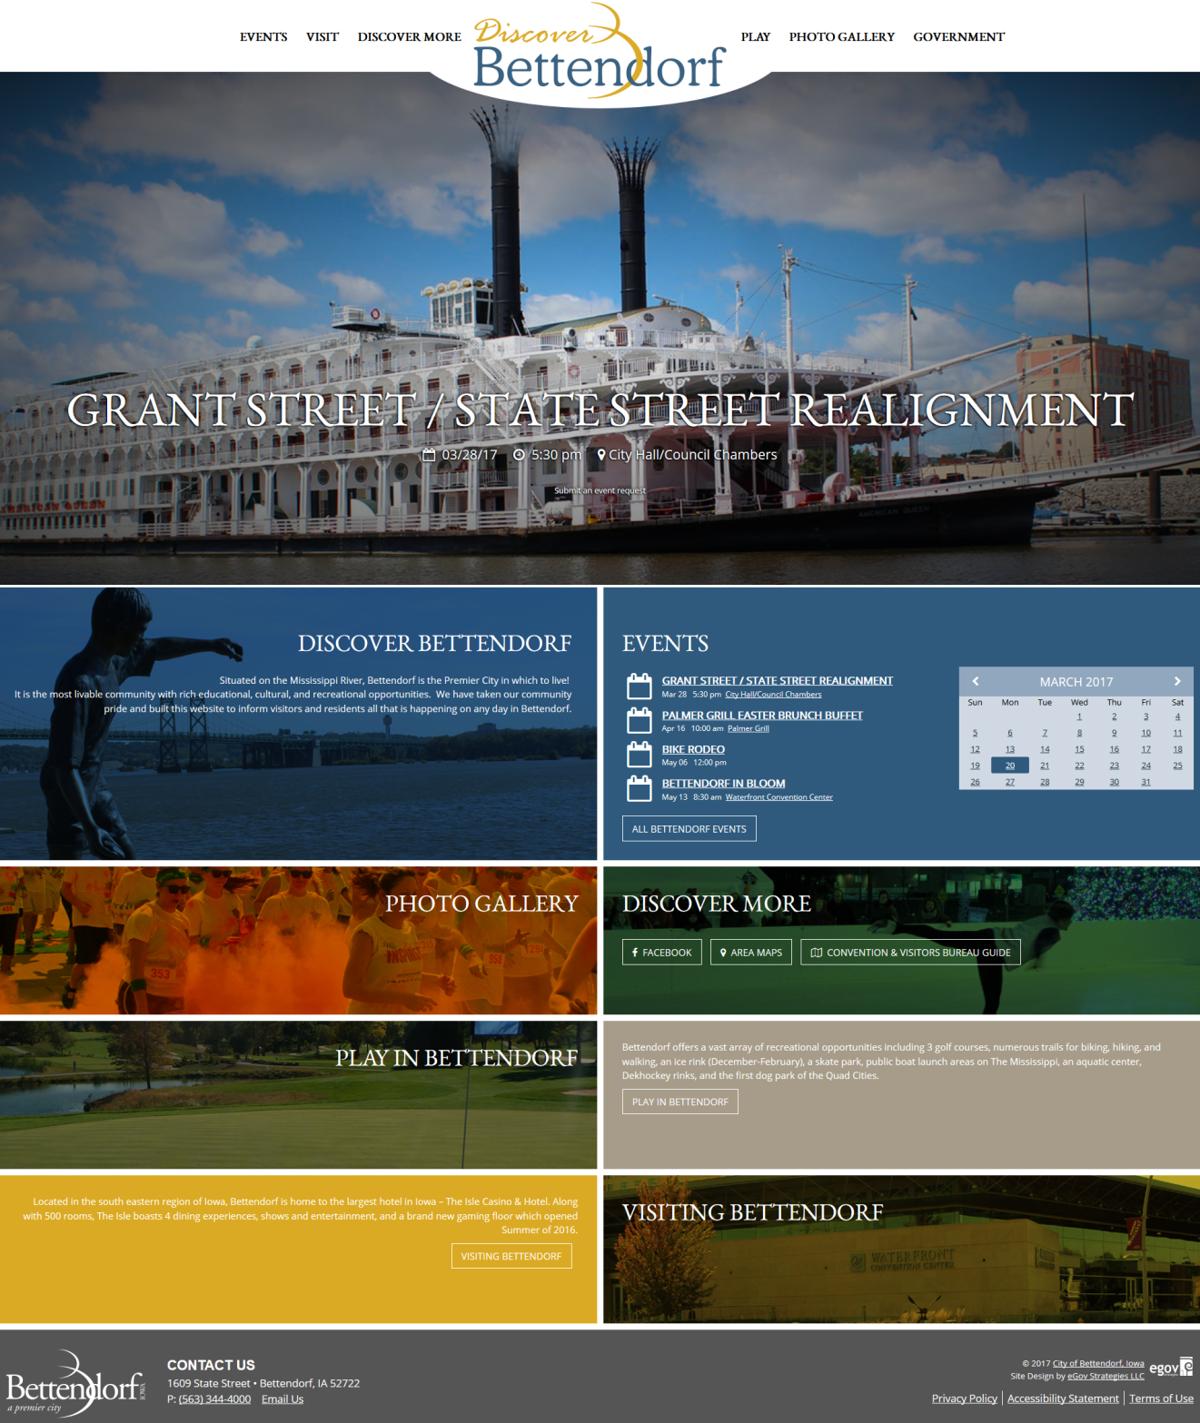 Bettendorf unveils new websites